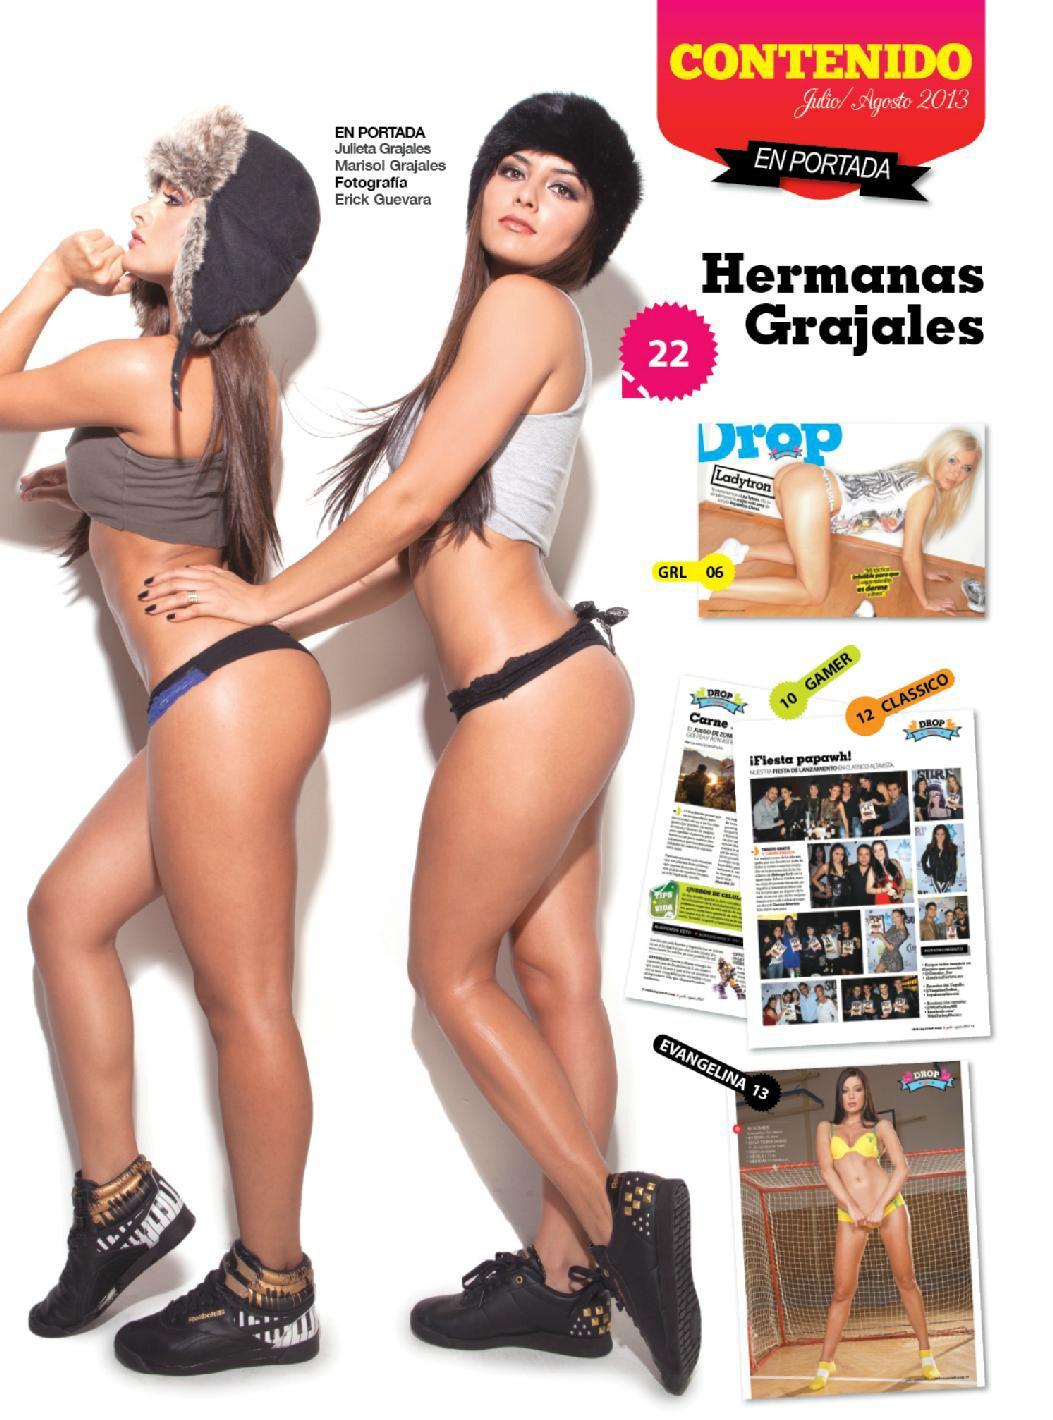 - Julieta-&-Marisol-Grajales---SURF-Chilanga-Magazine-2013--02